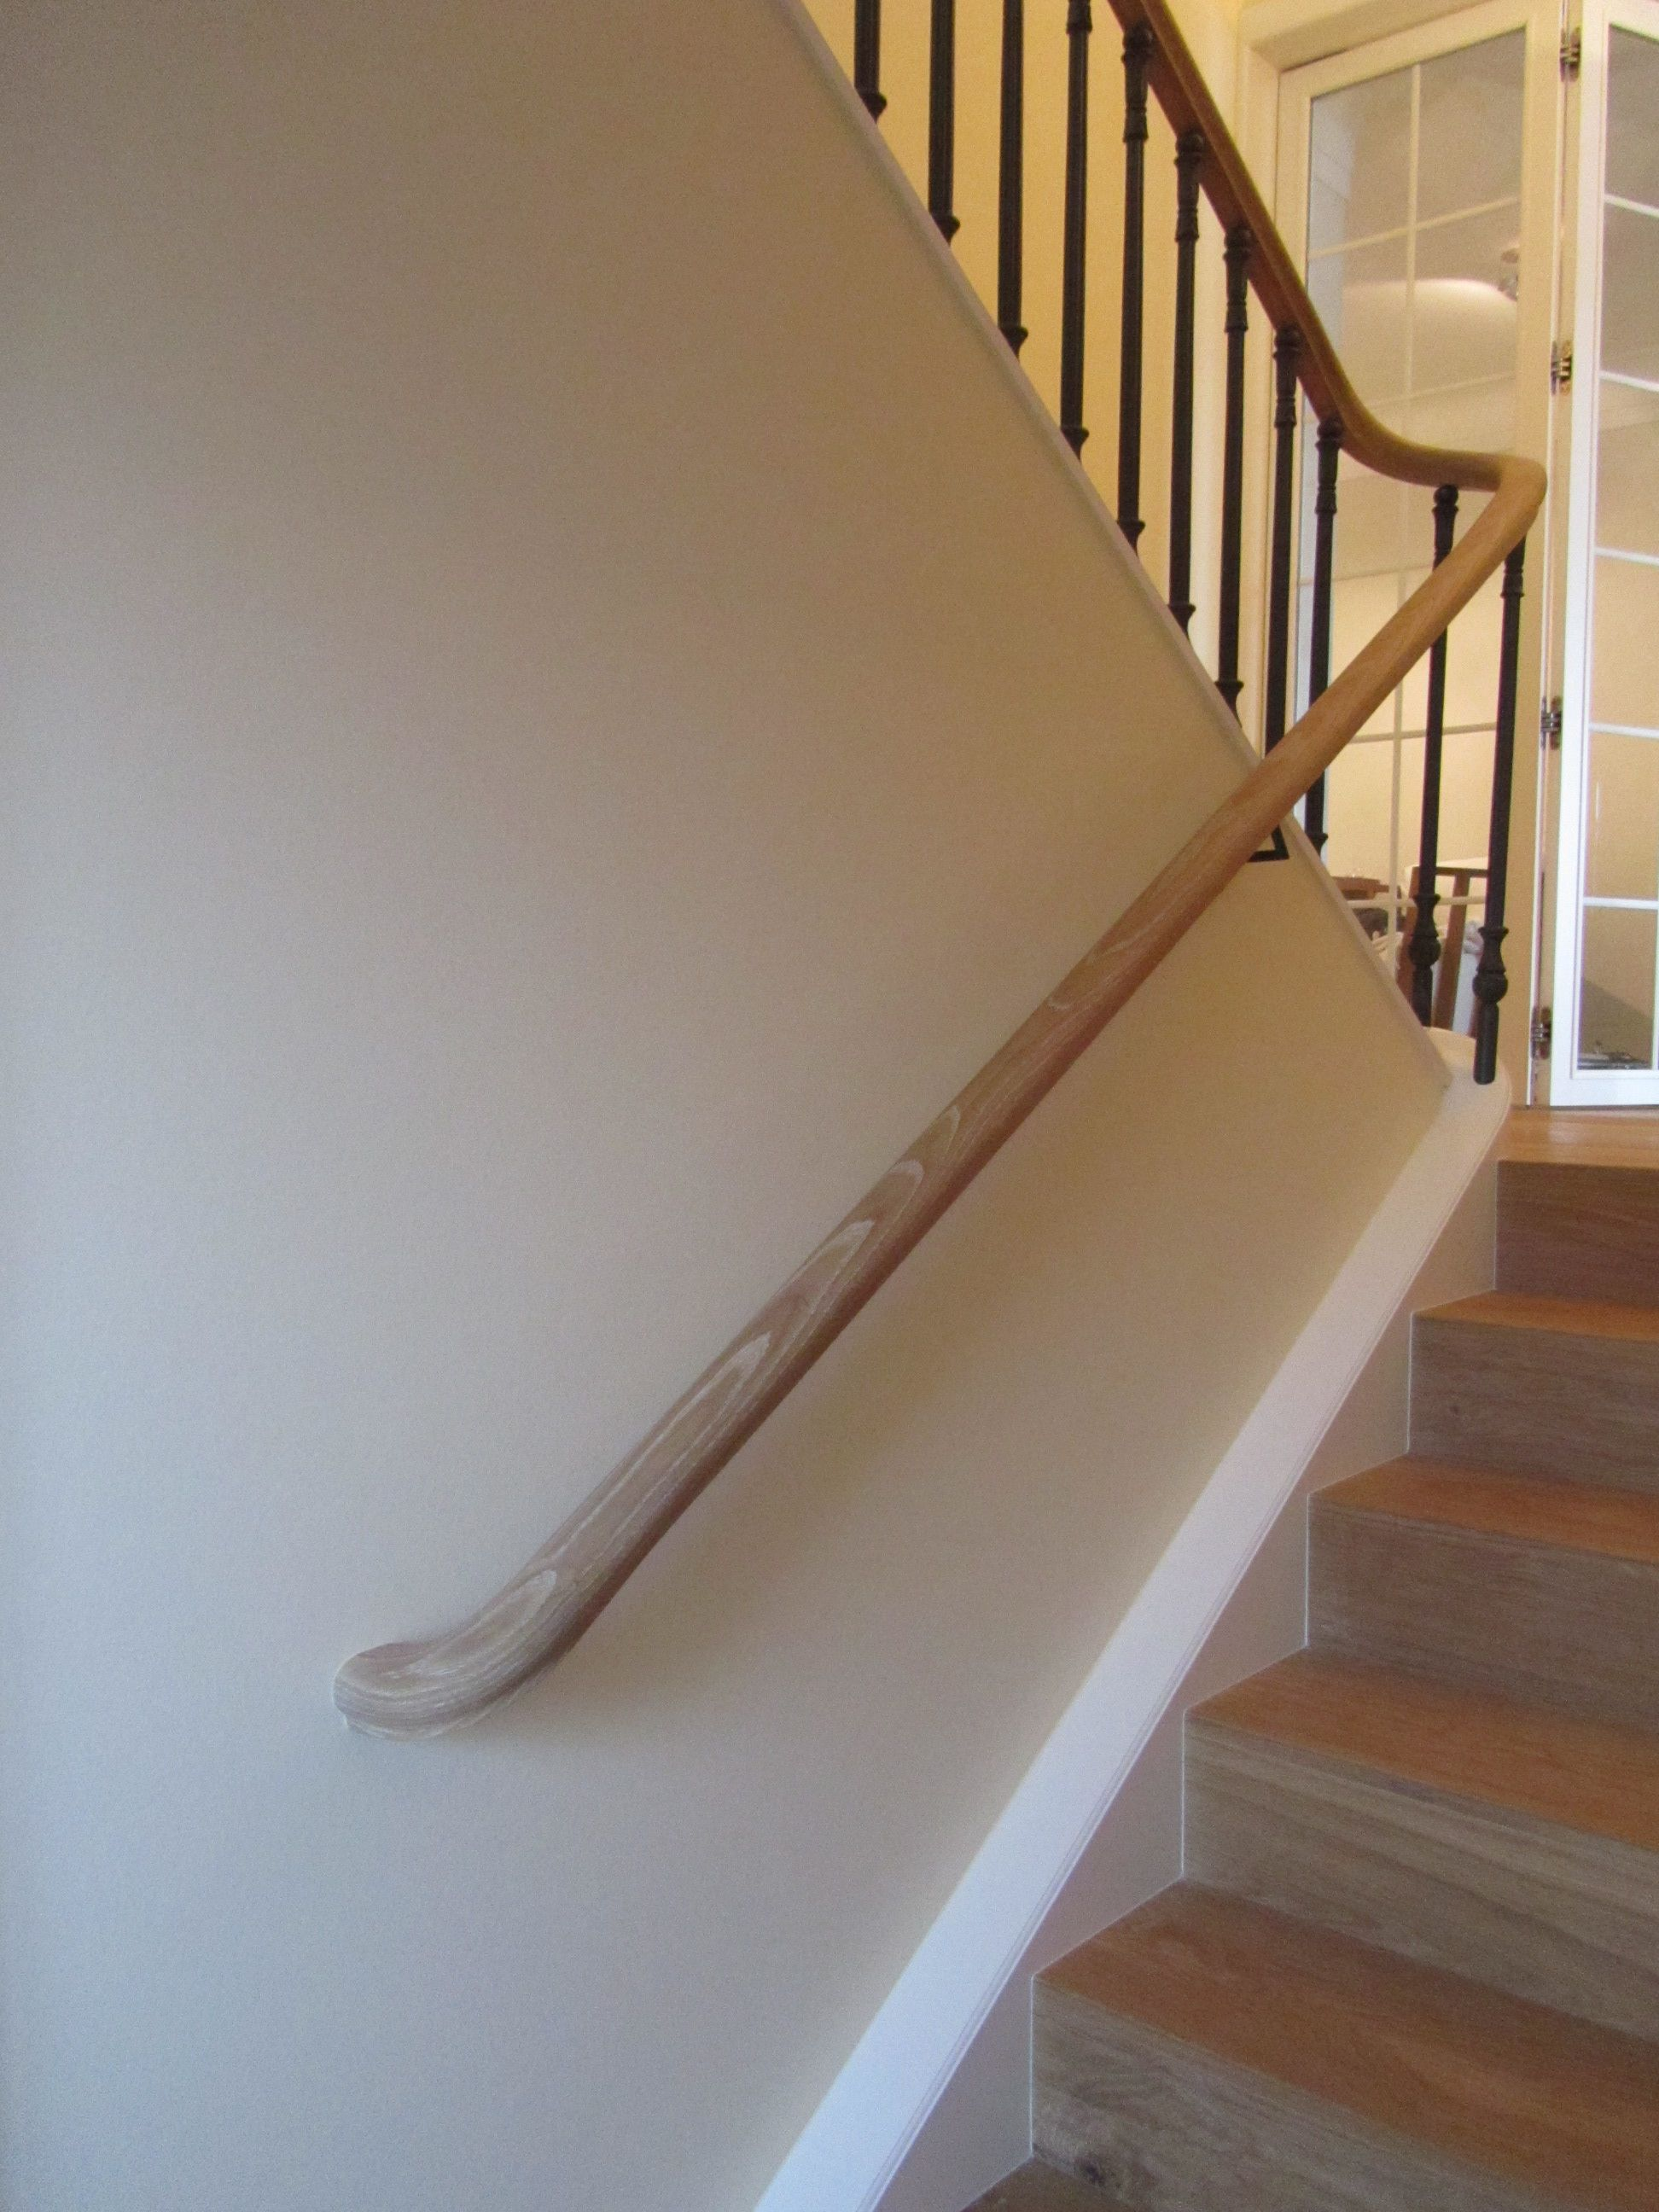 Stair Image 311